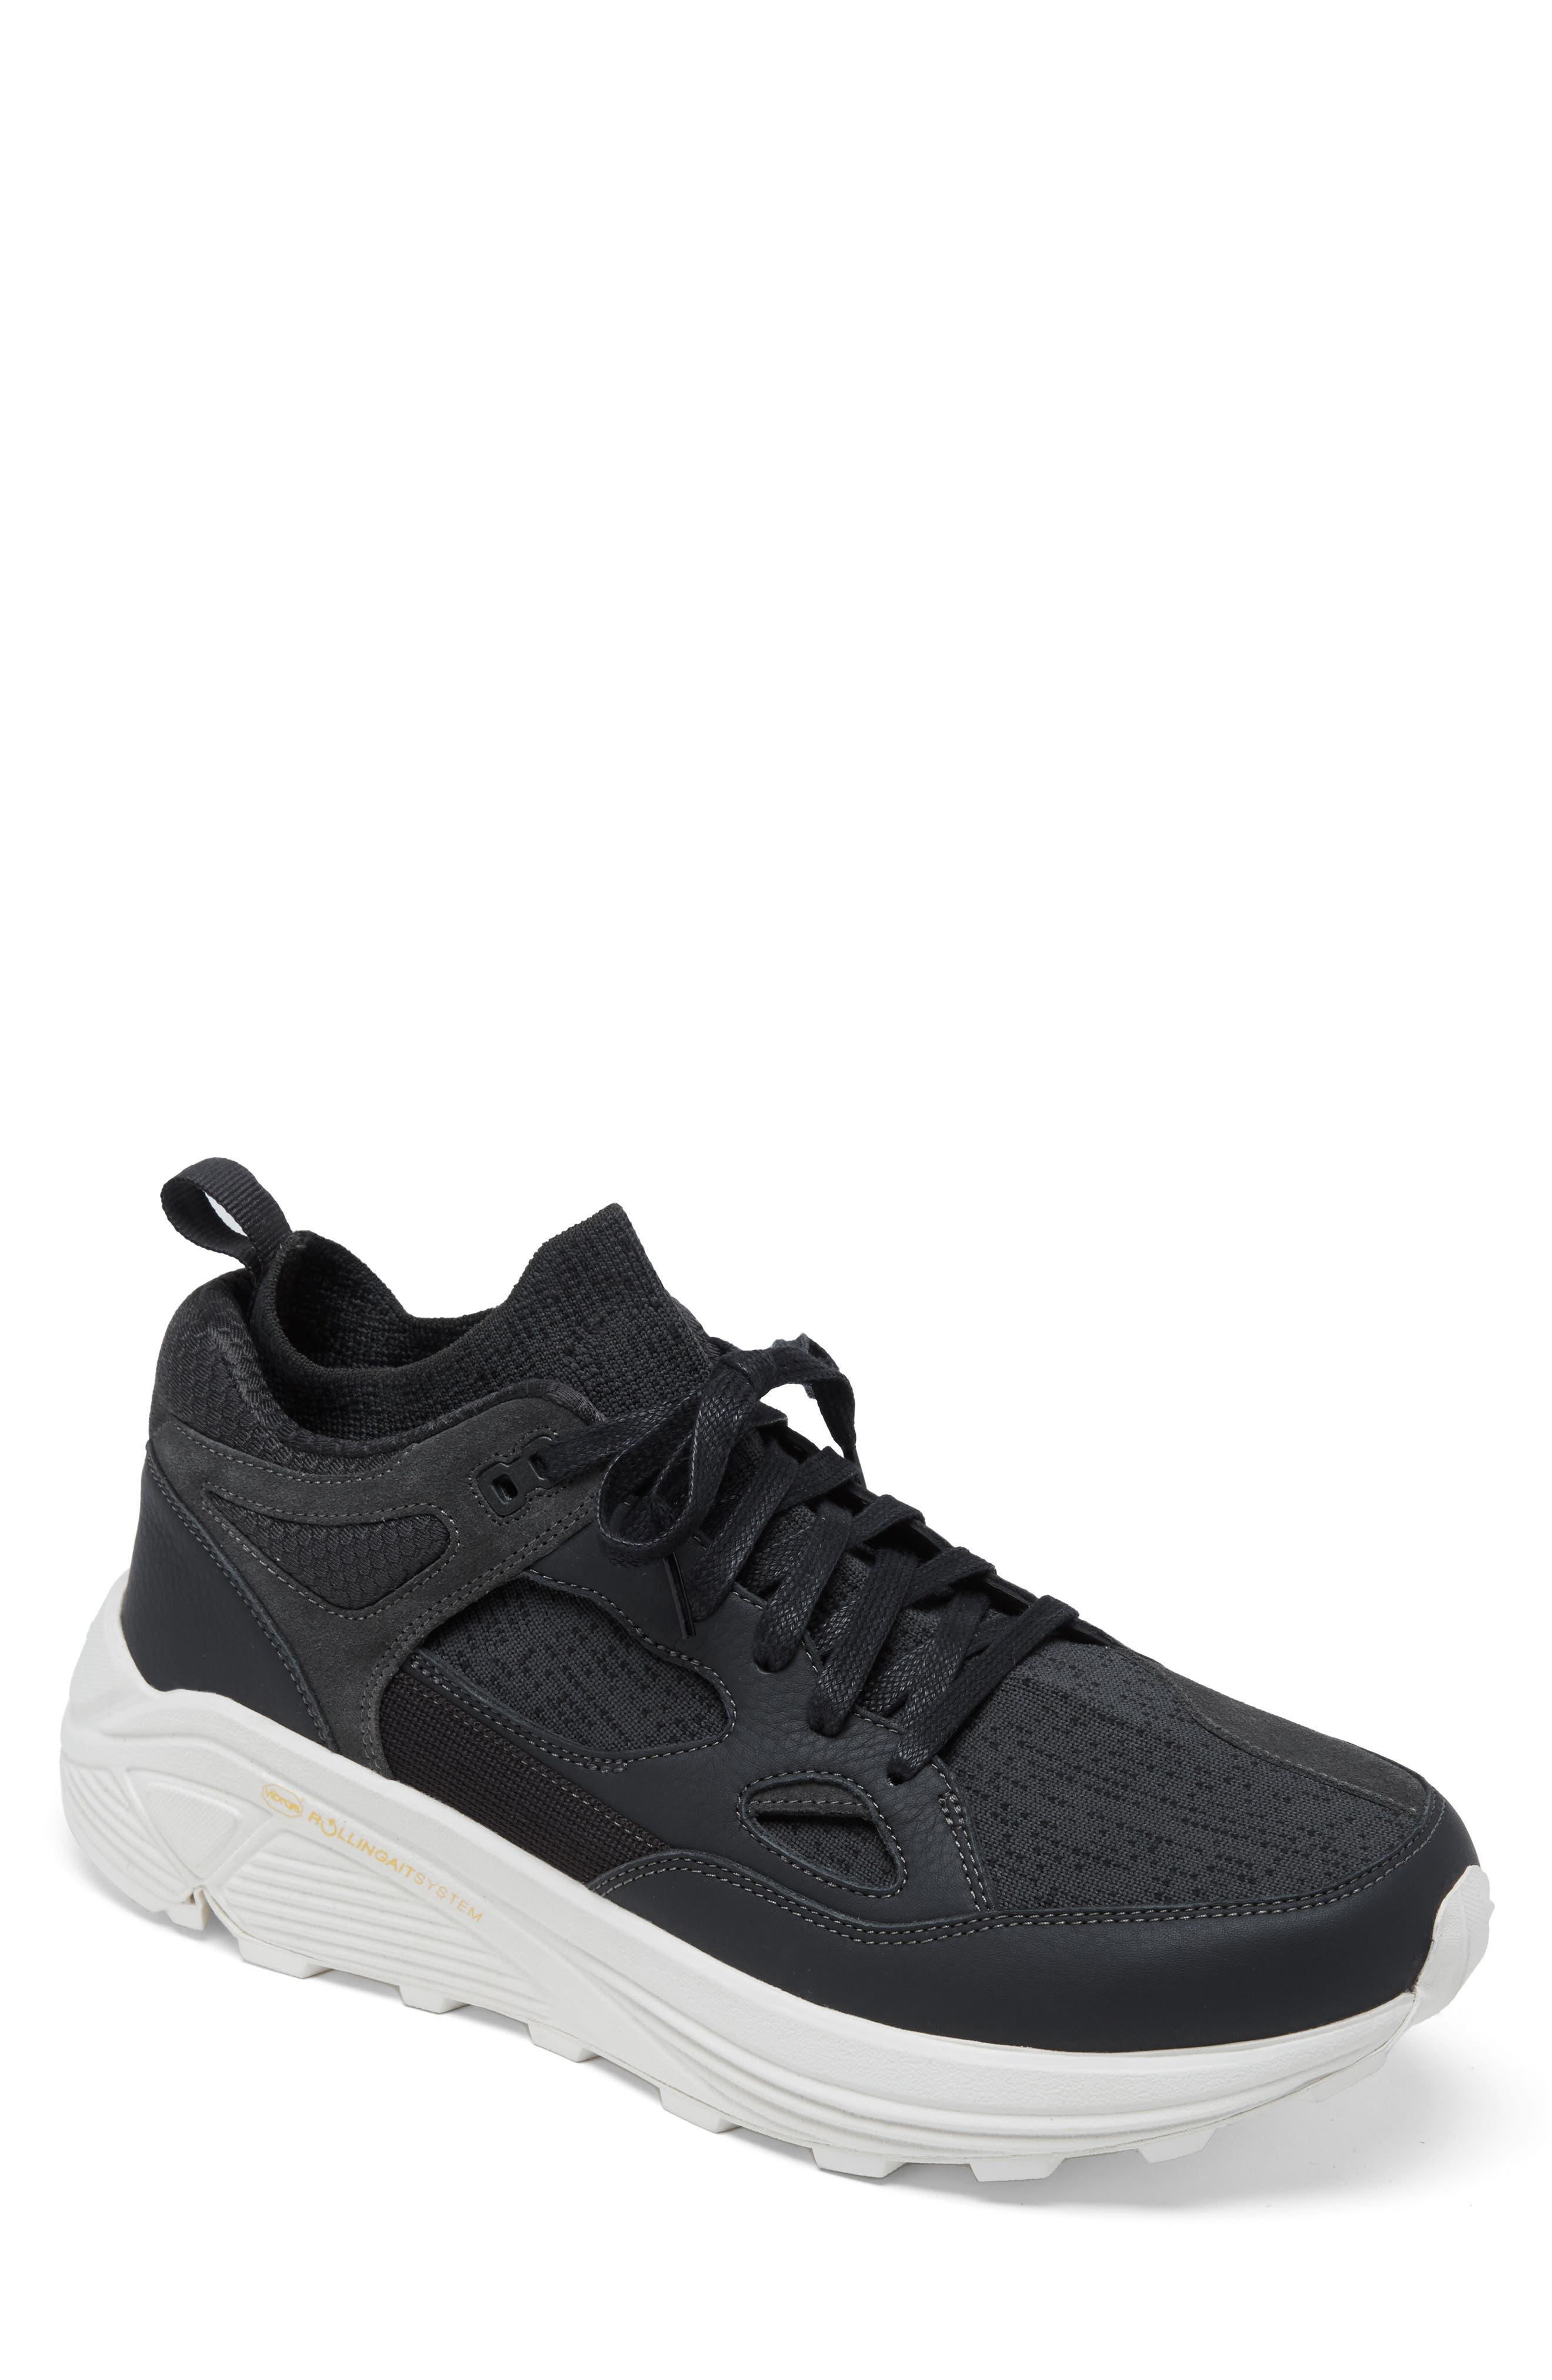 Aura Sneaker,                             Main thumbnail 1, color,                             011